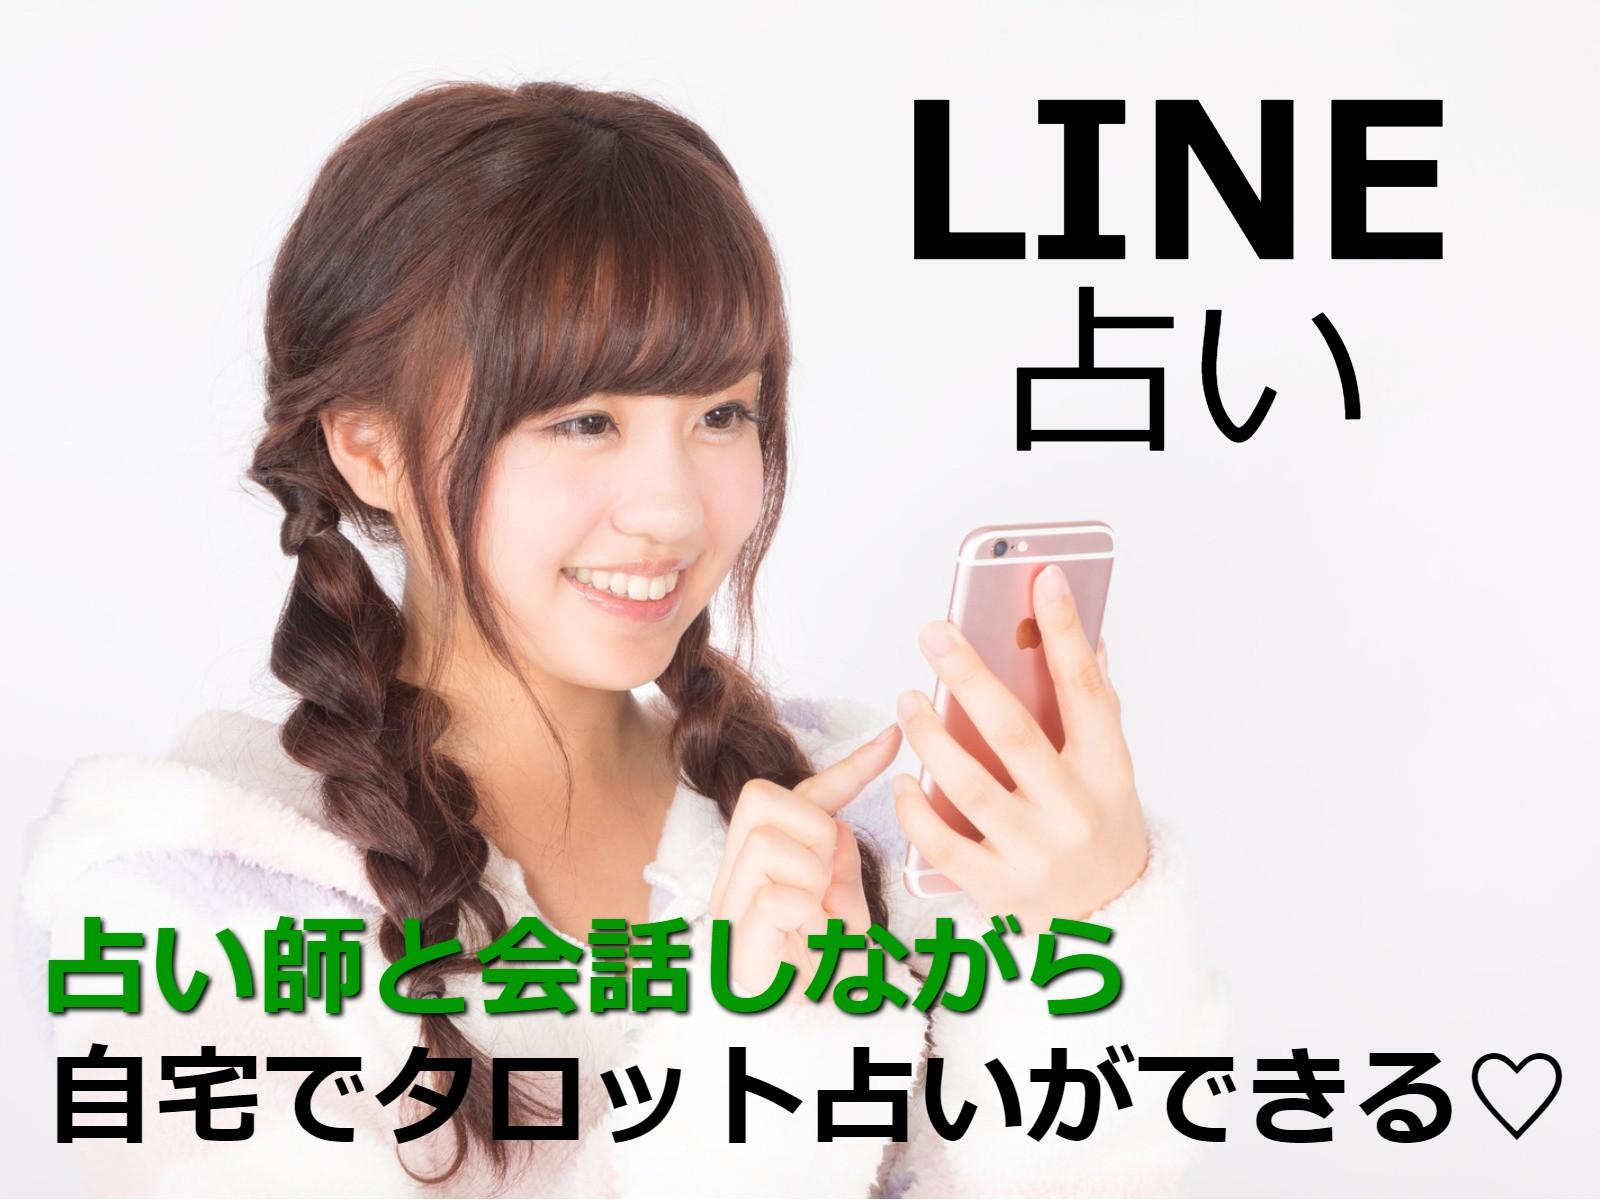 LINE占い。自宅で占い師と対面鑑定ができる新感覚の占いプラン。日本全国からご予約を受付中!